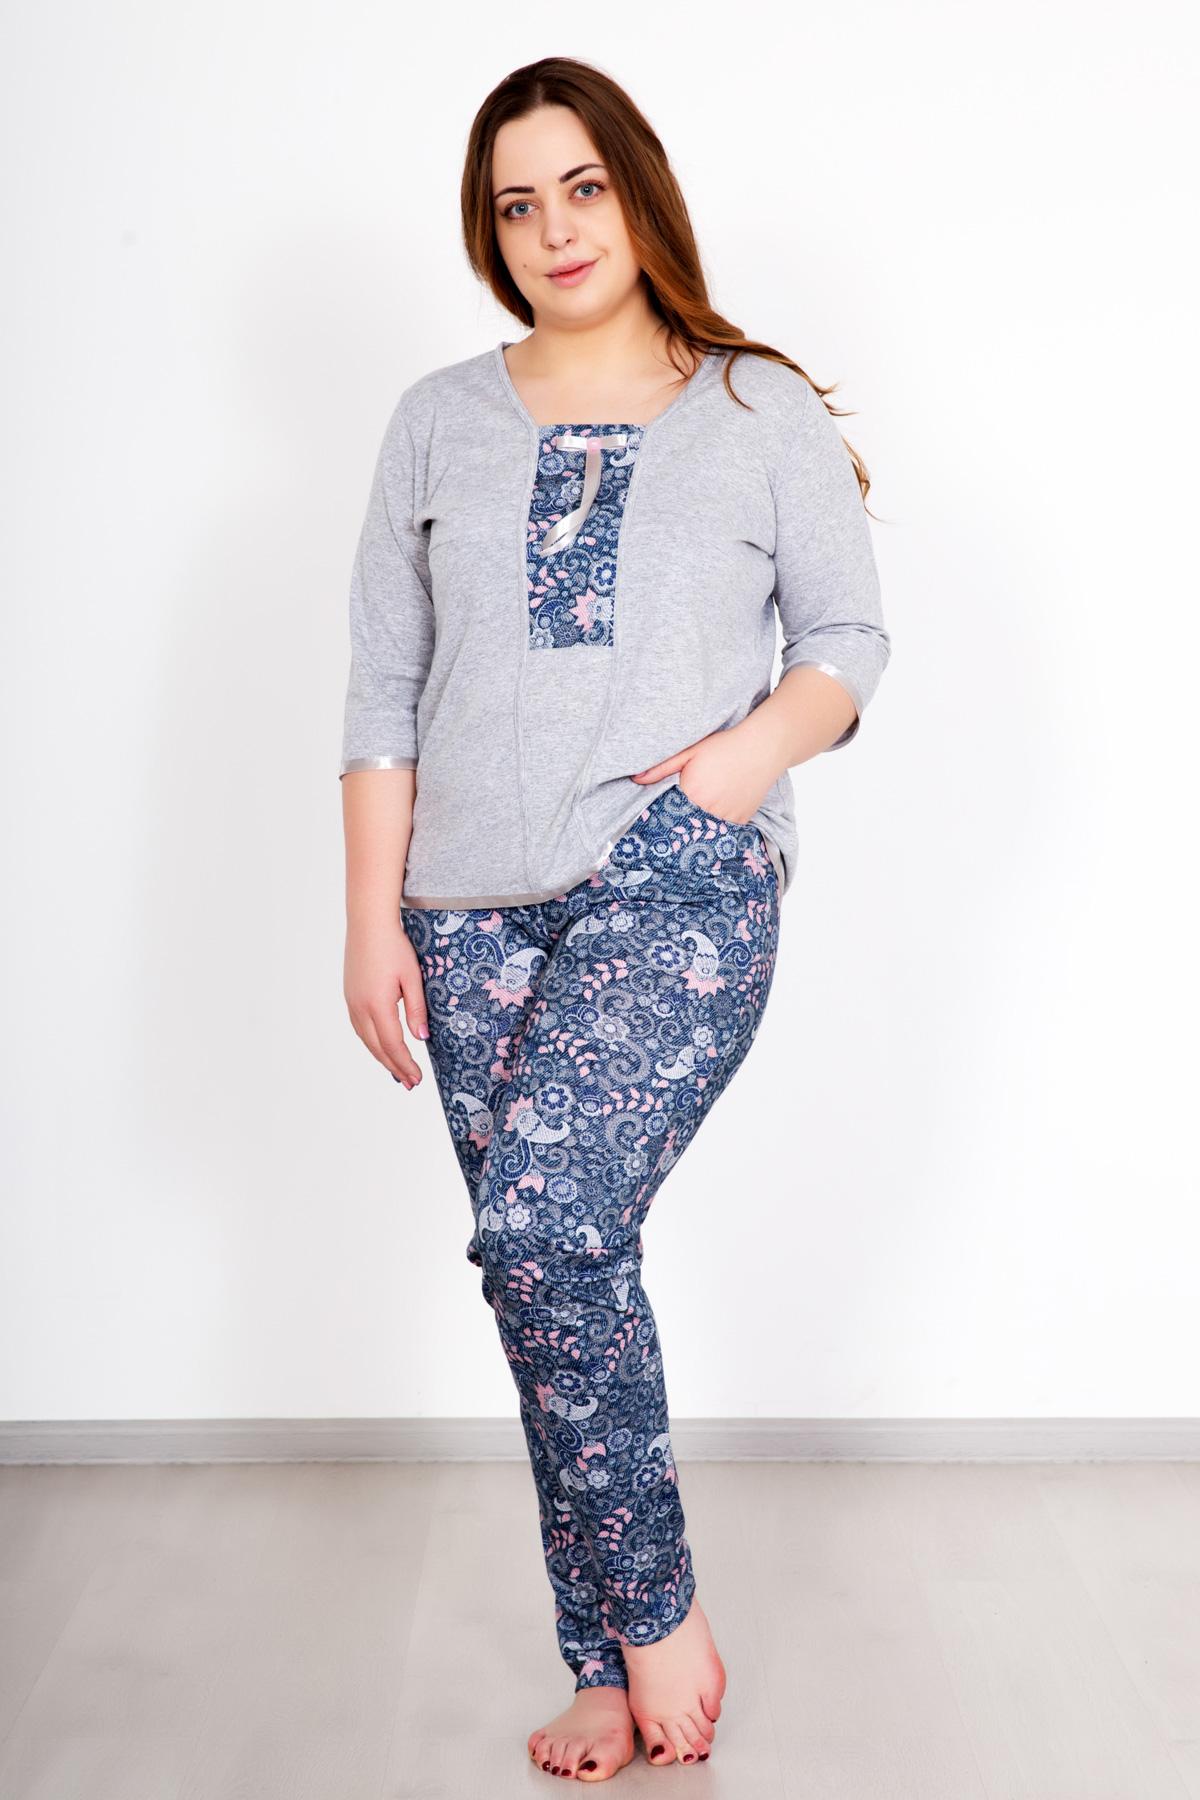 Жен. костюм  Медуница  р. 62 - Женская одежда артикул: 33425